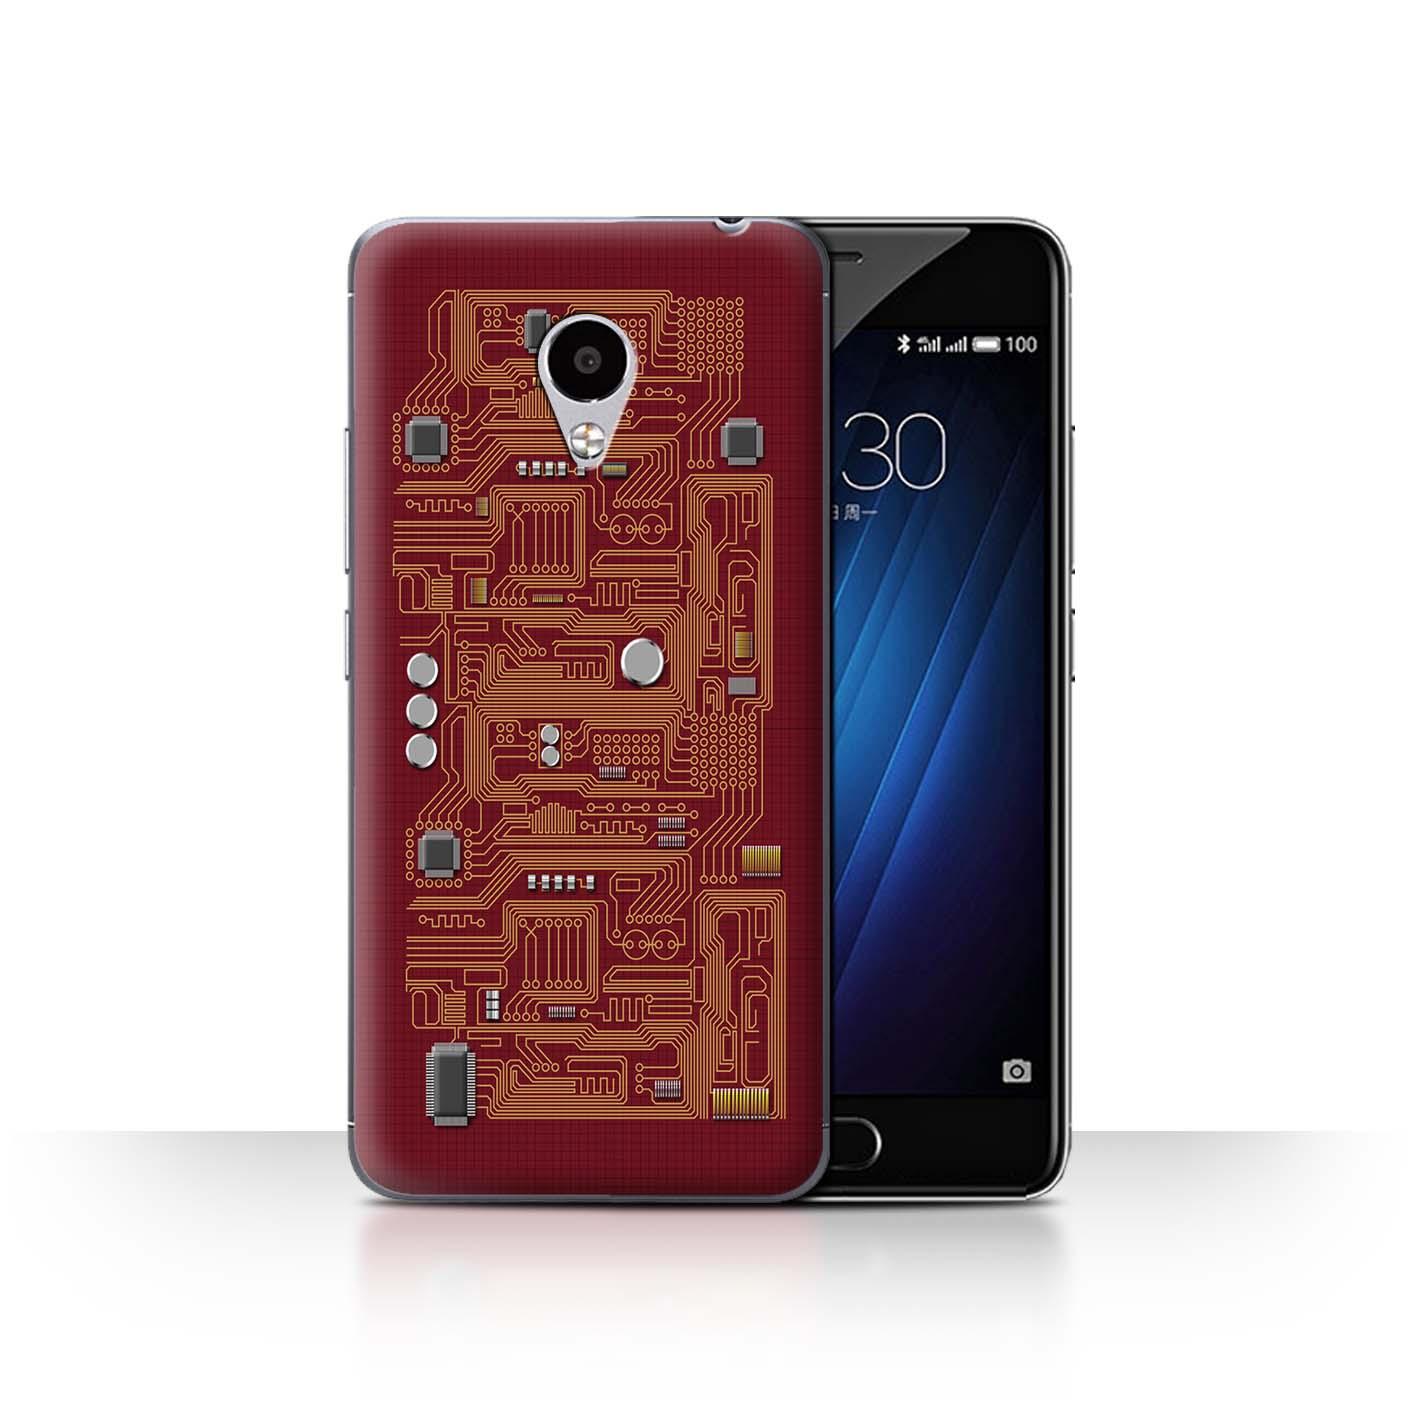 STUFF4-Back-Case-Cover-Skin-for-Meizu-M3S-Circuit-Board